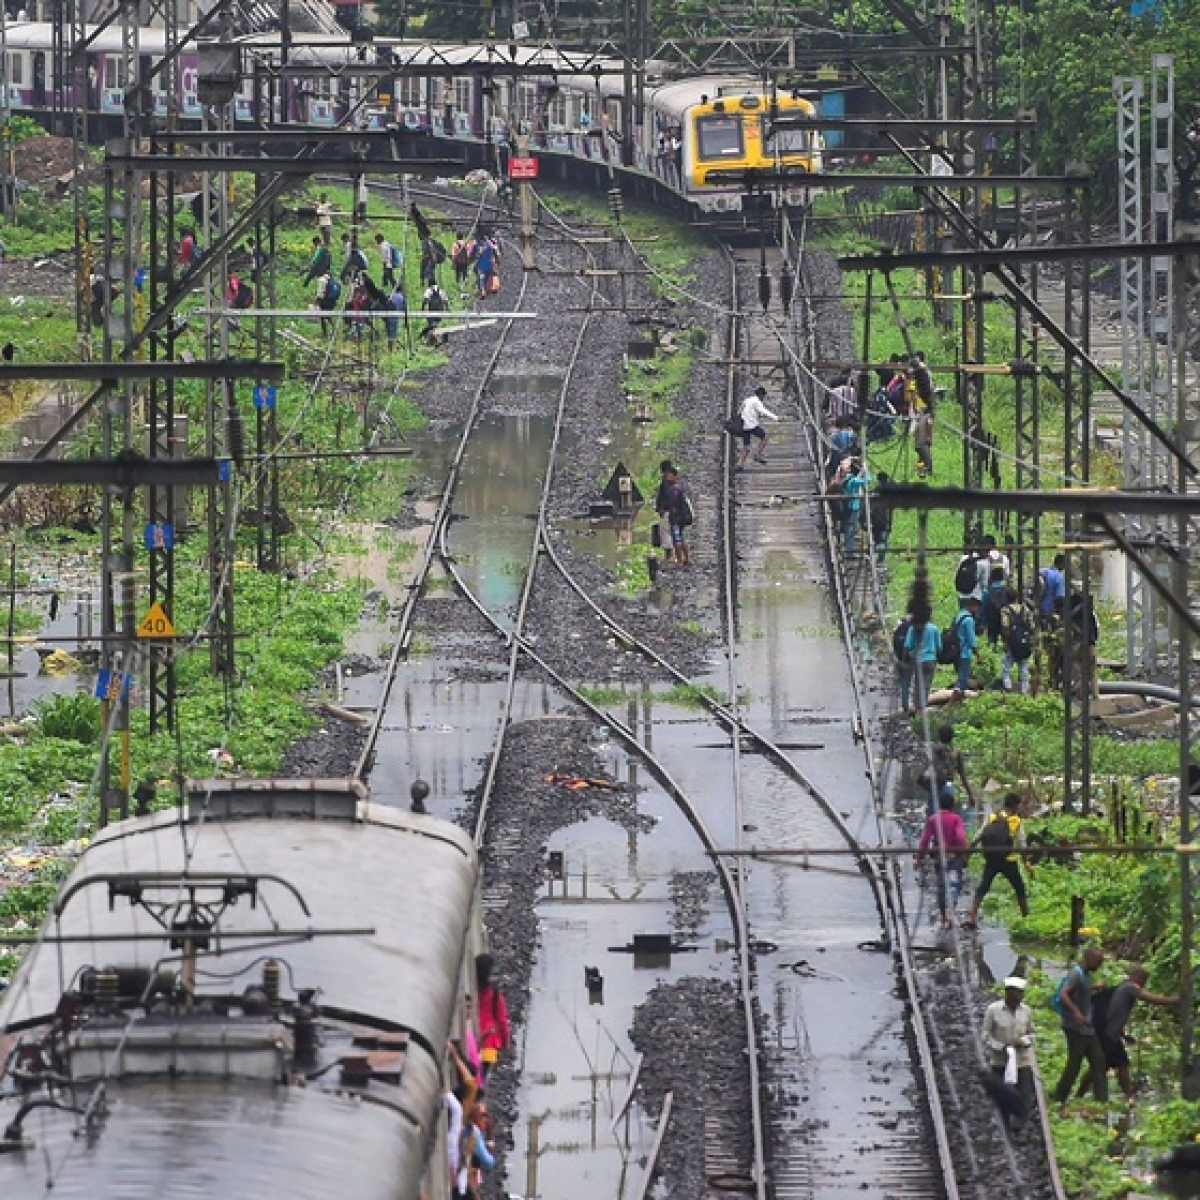 Mumbai Rains: A long roller coaster night; Journey from Nariman Point to Badlapur